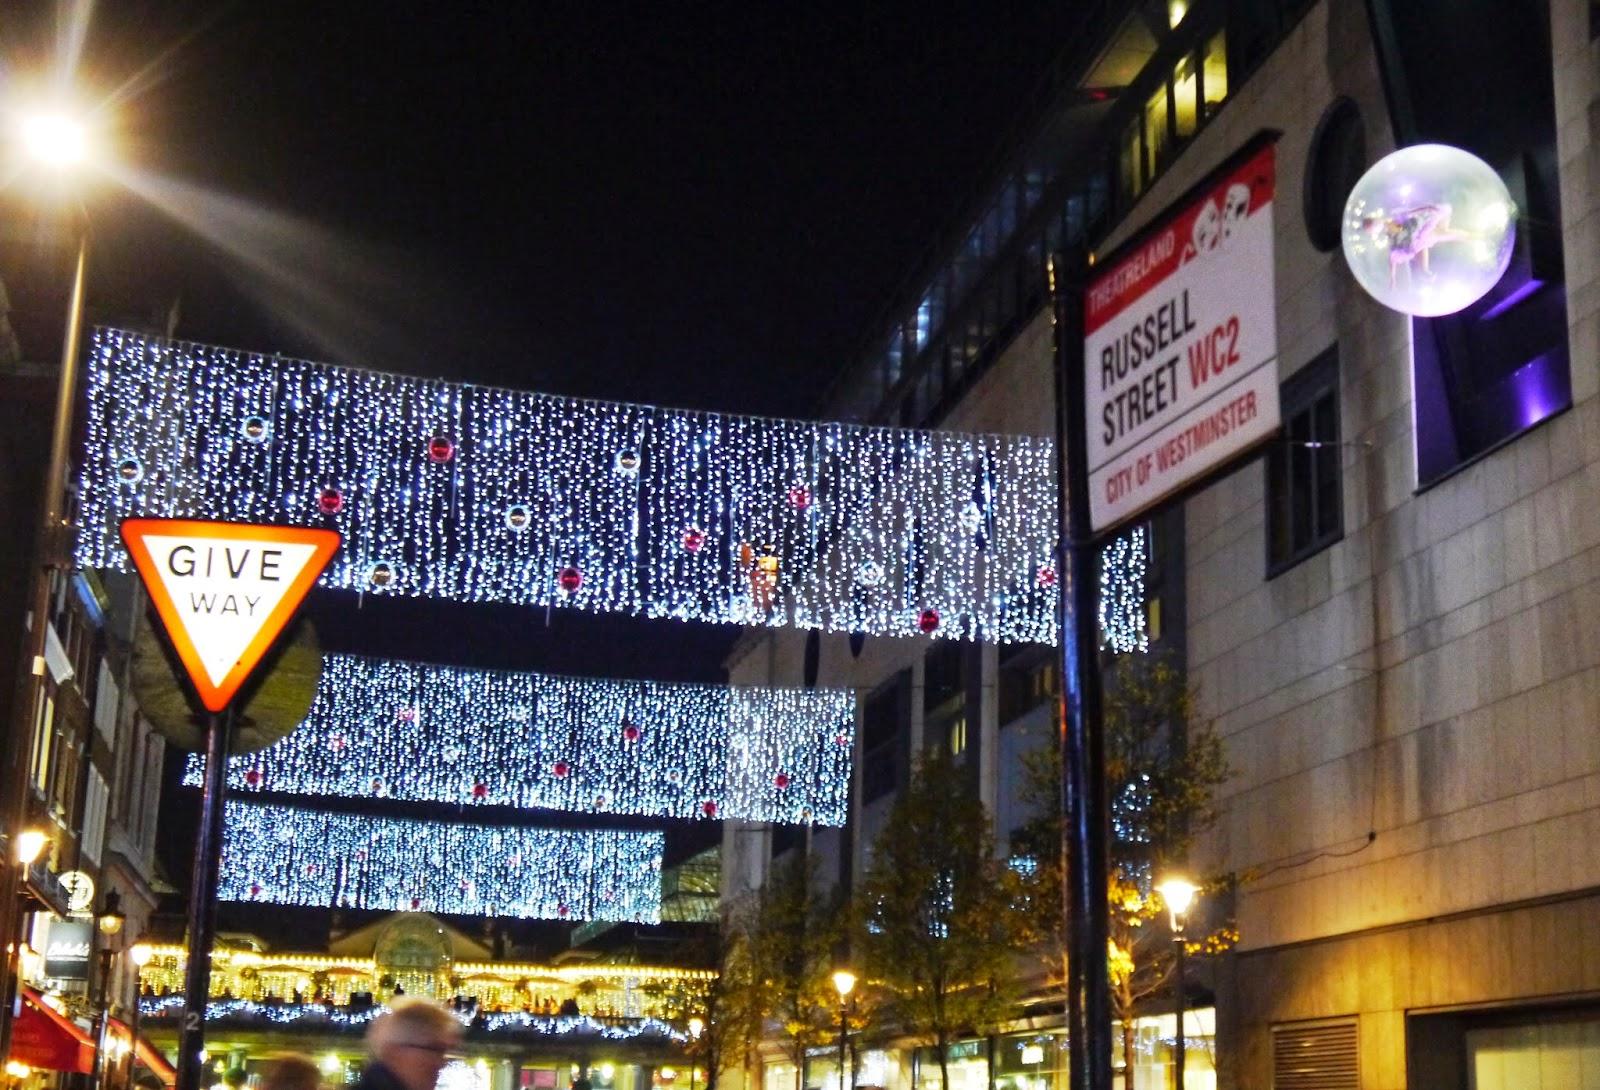 Russell Street Lights